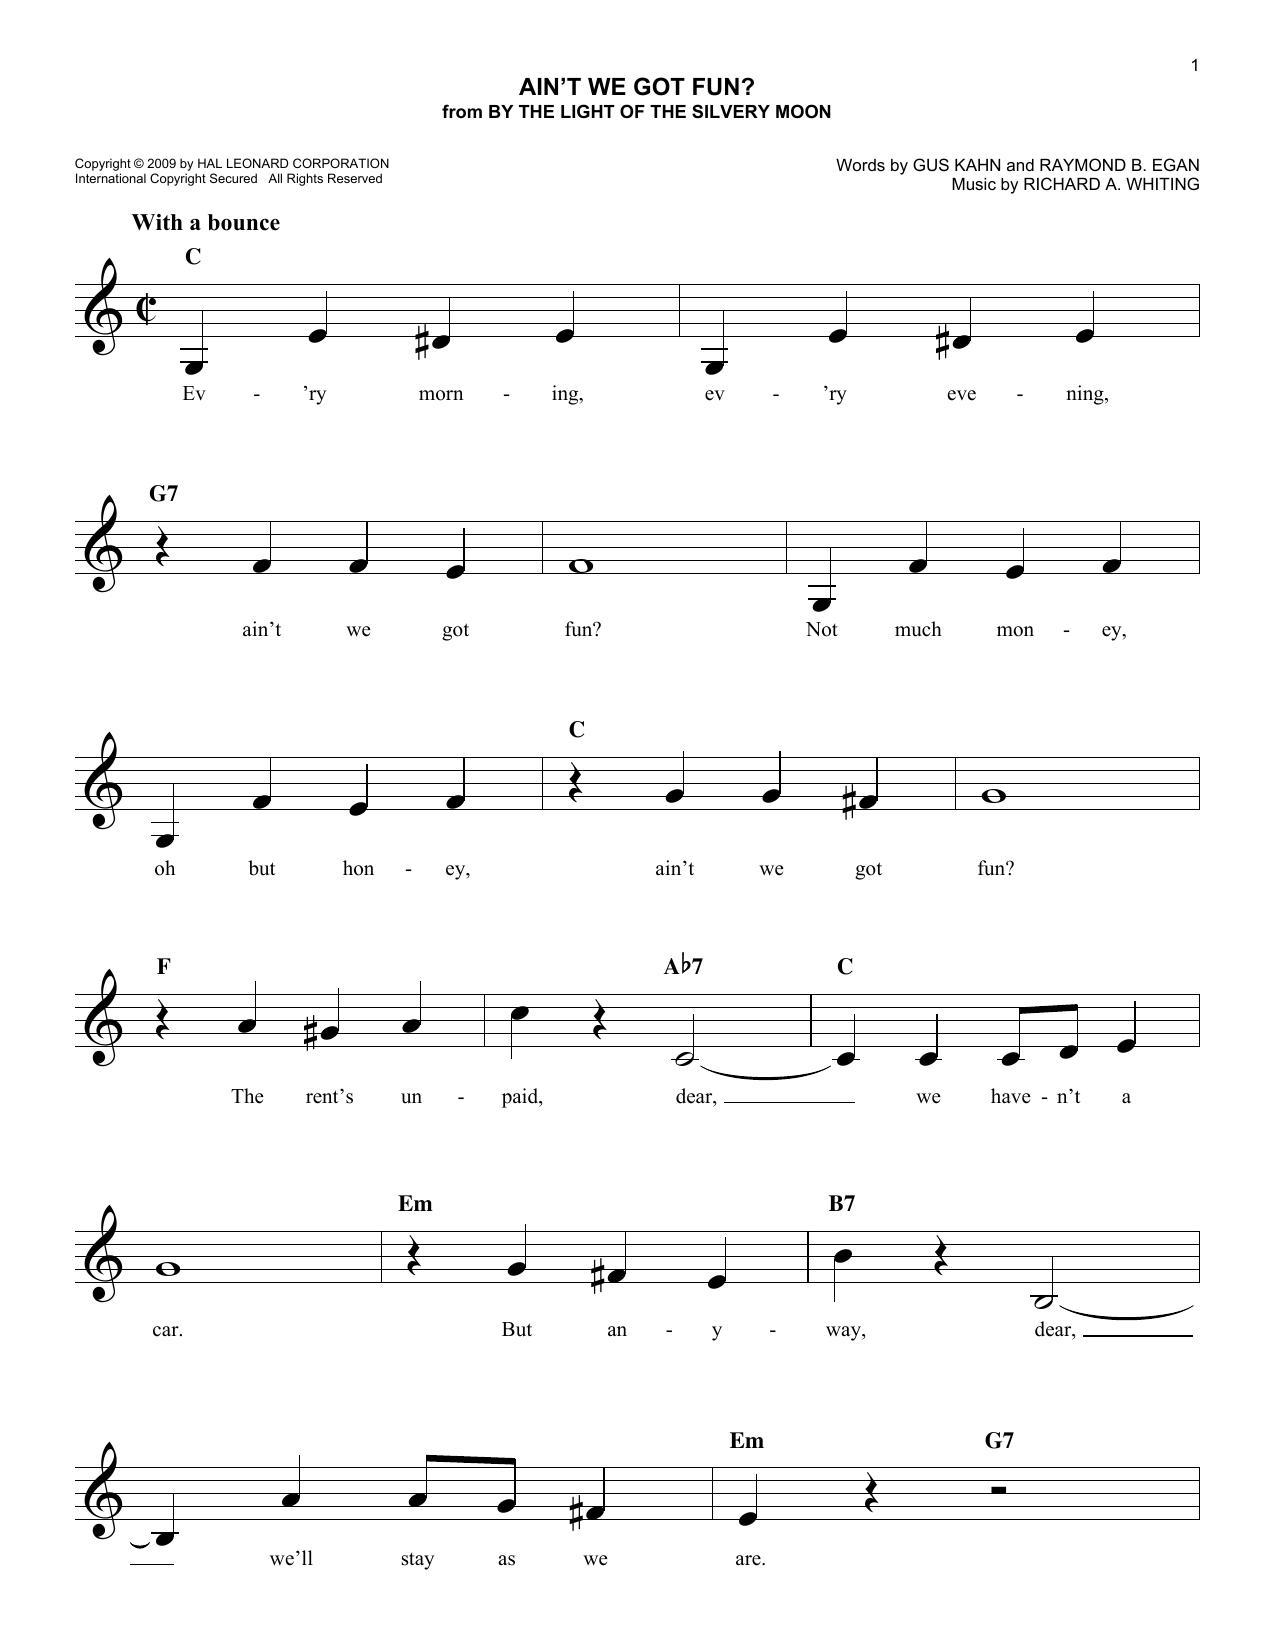 Gus Kahn Ain't We Got Fun? sheet music notes and chords. Download Printable PDF.